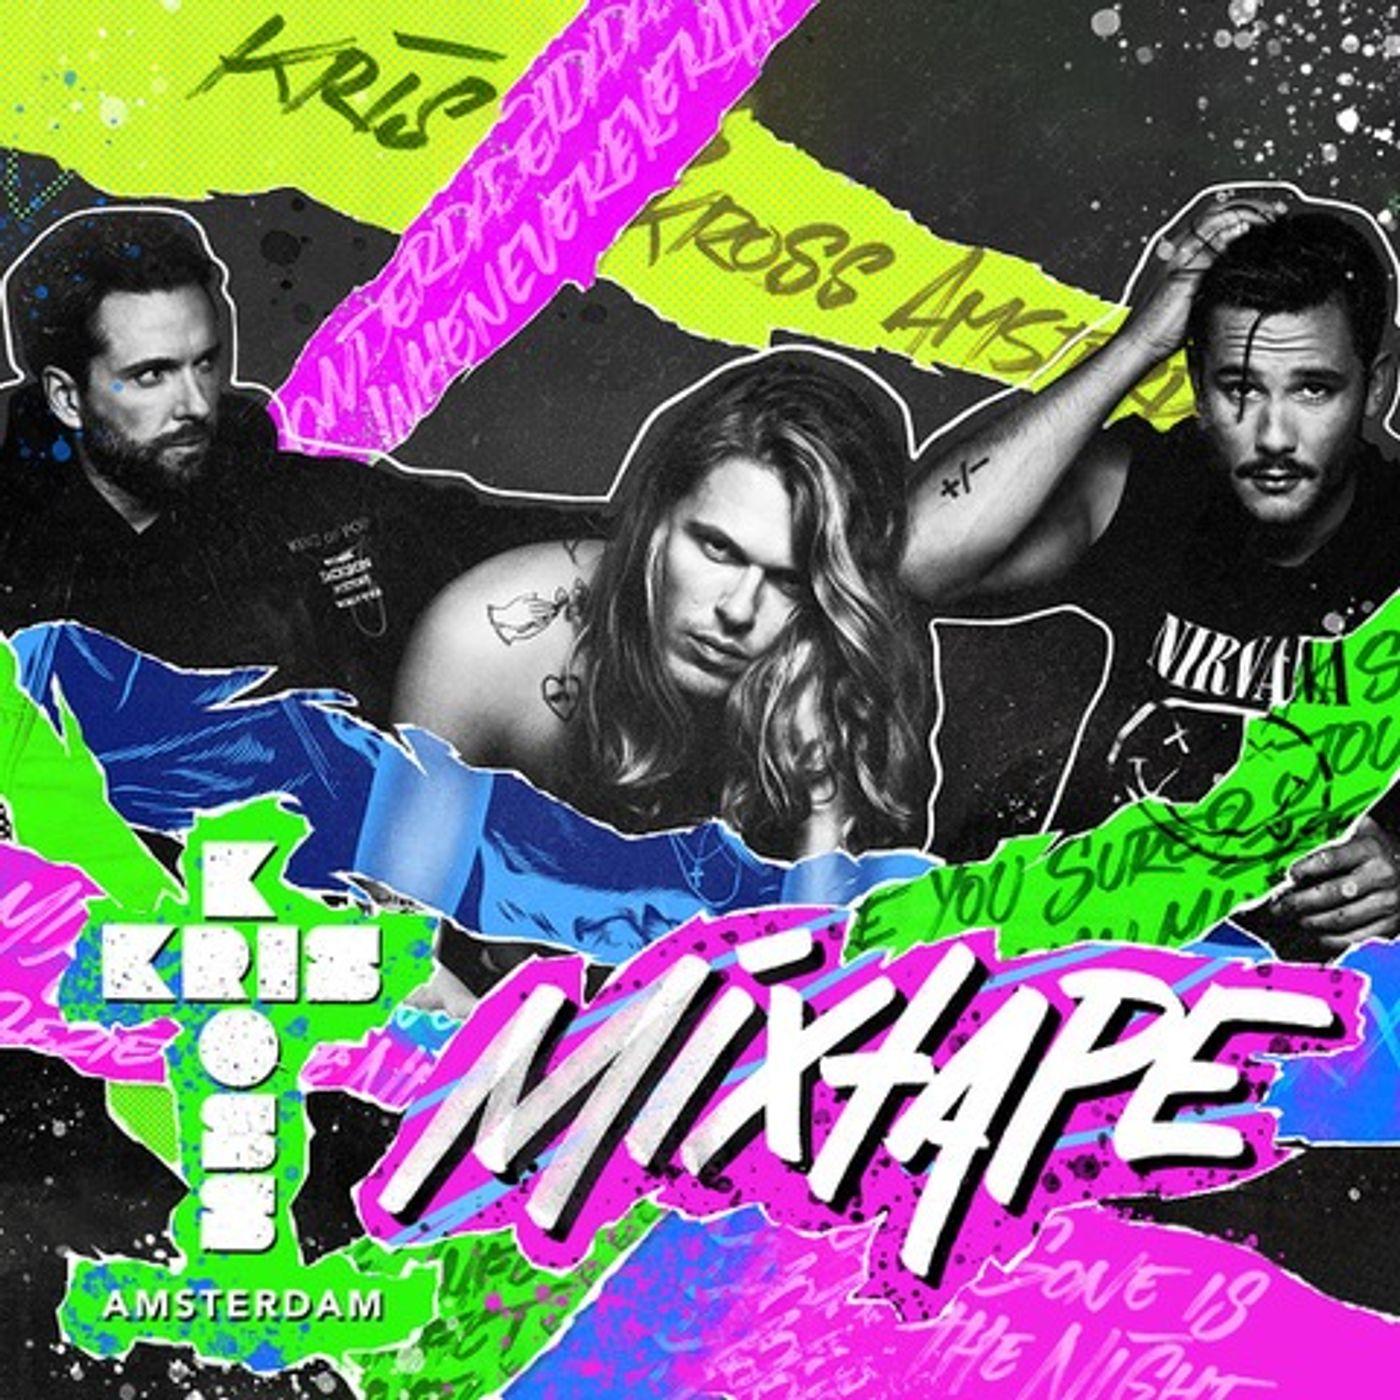 Kris Kross Amsterdam | Kris Kross Mixtape #124